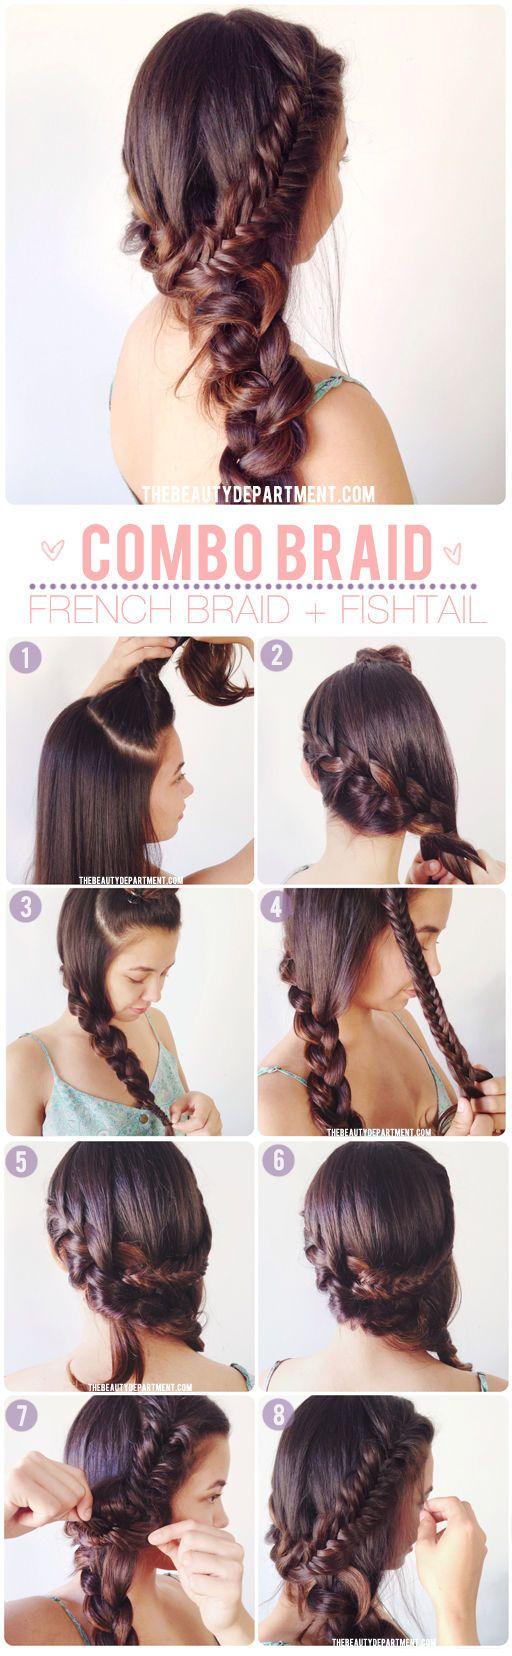 summer braid 1 | fishtail, french plait and boho style